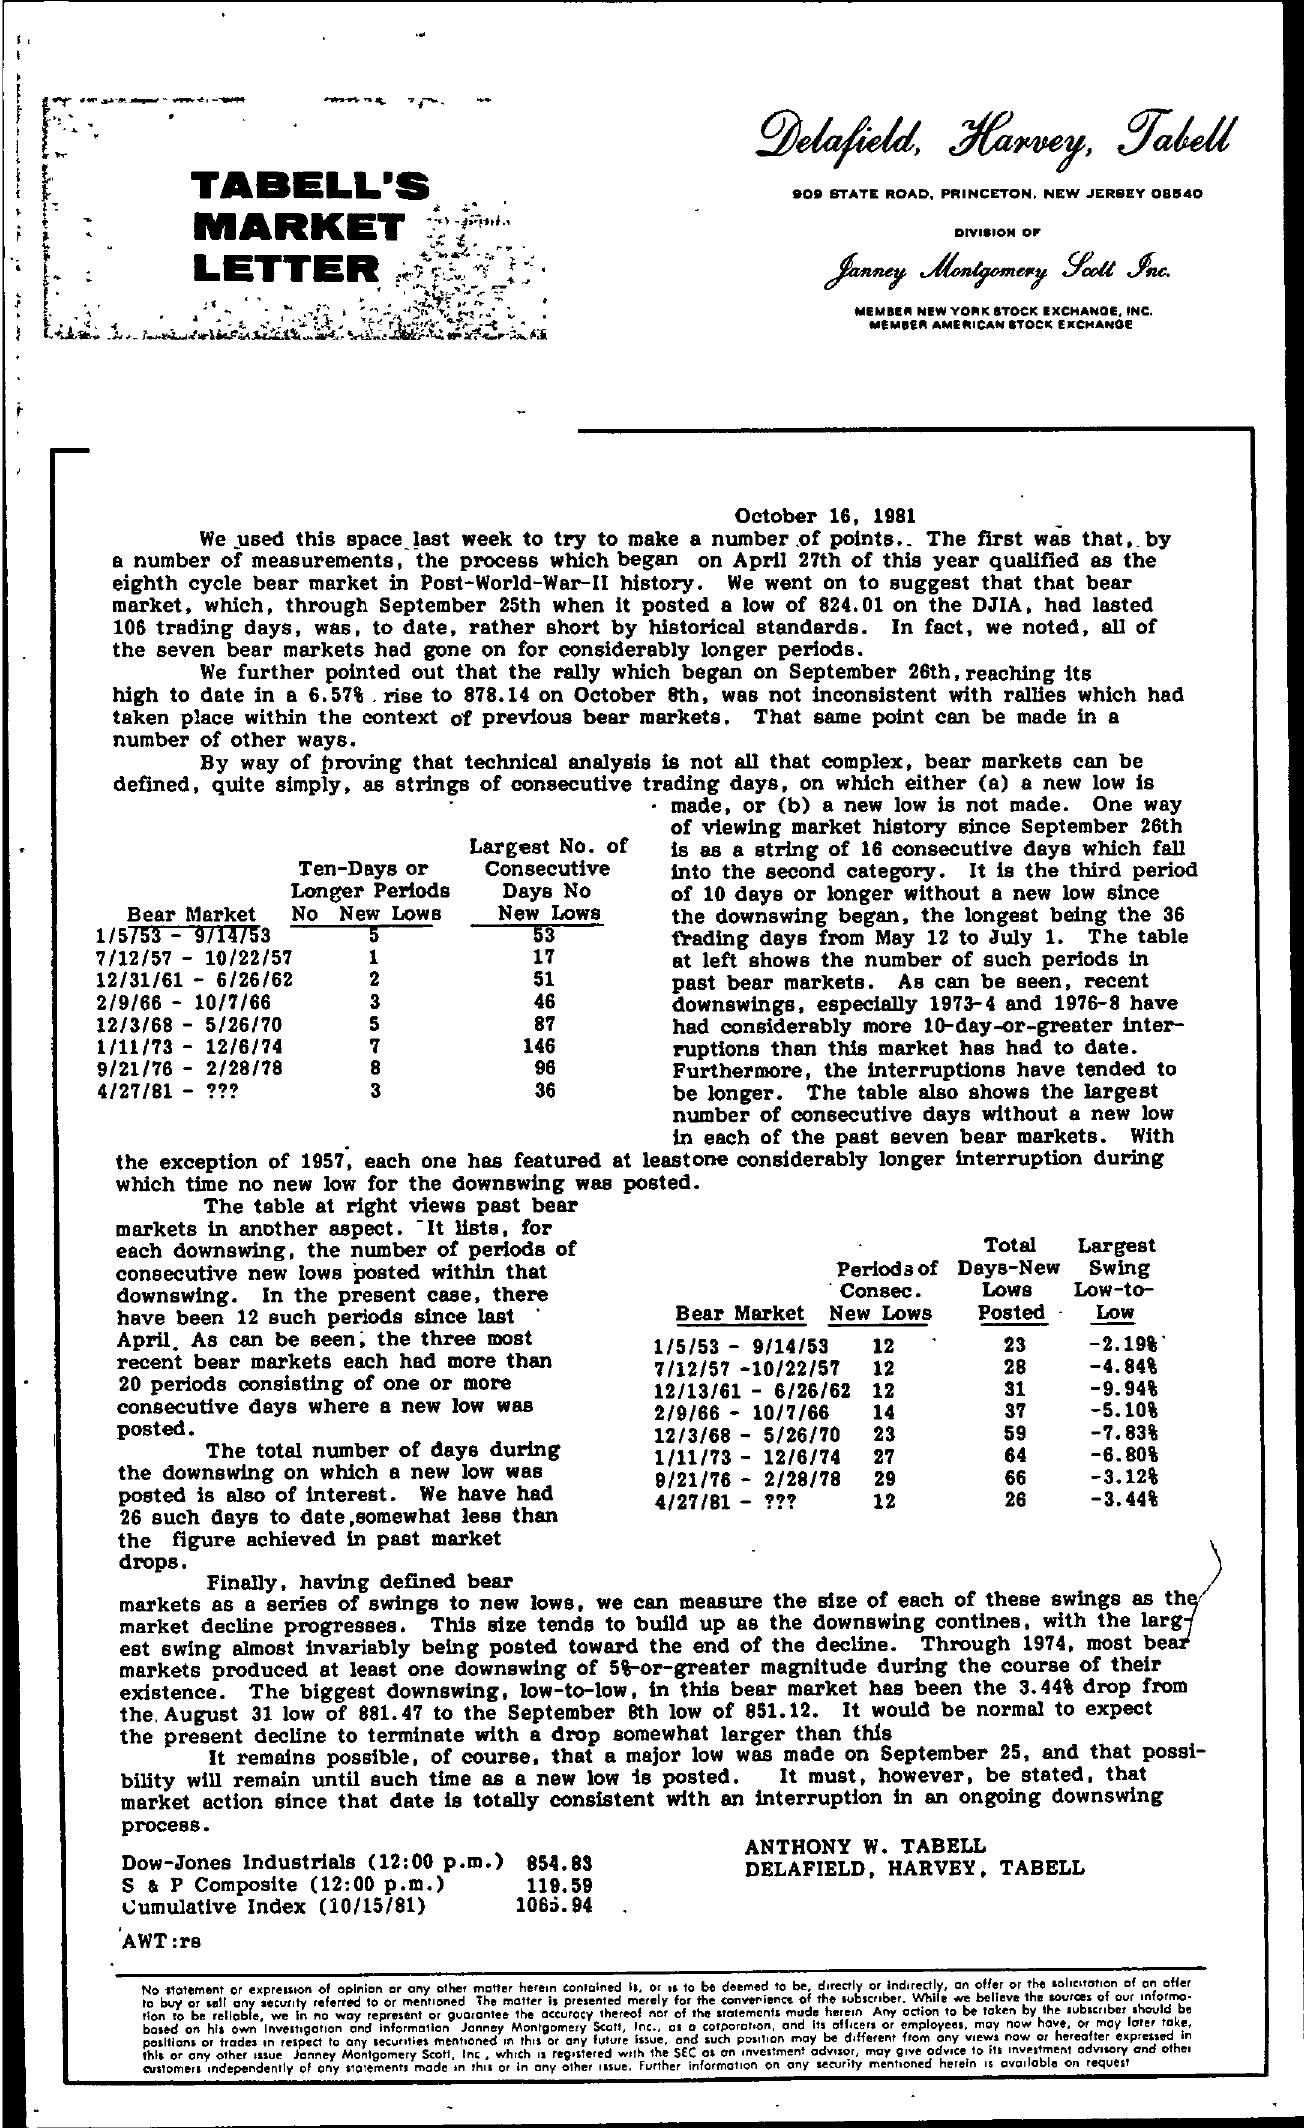 Tabell's Market Letter - October 16, 1981